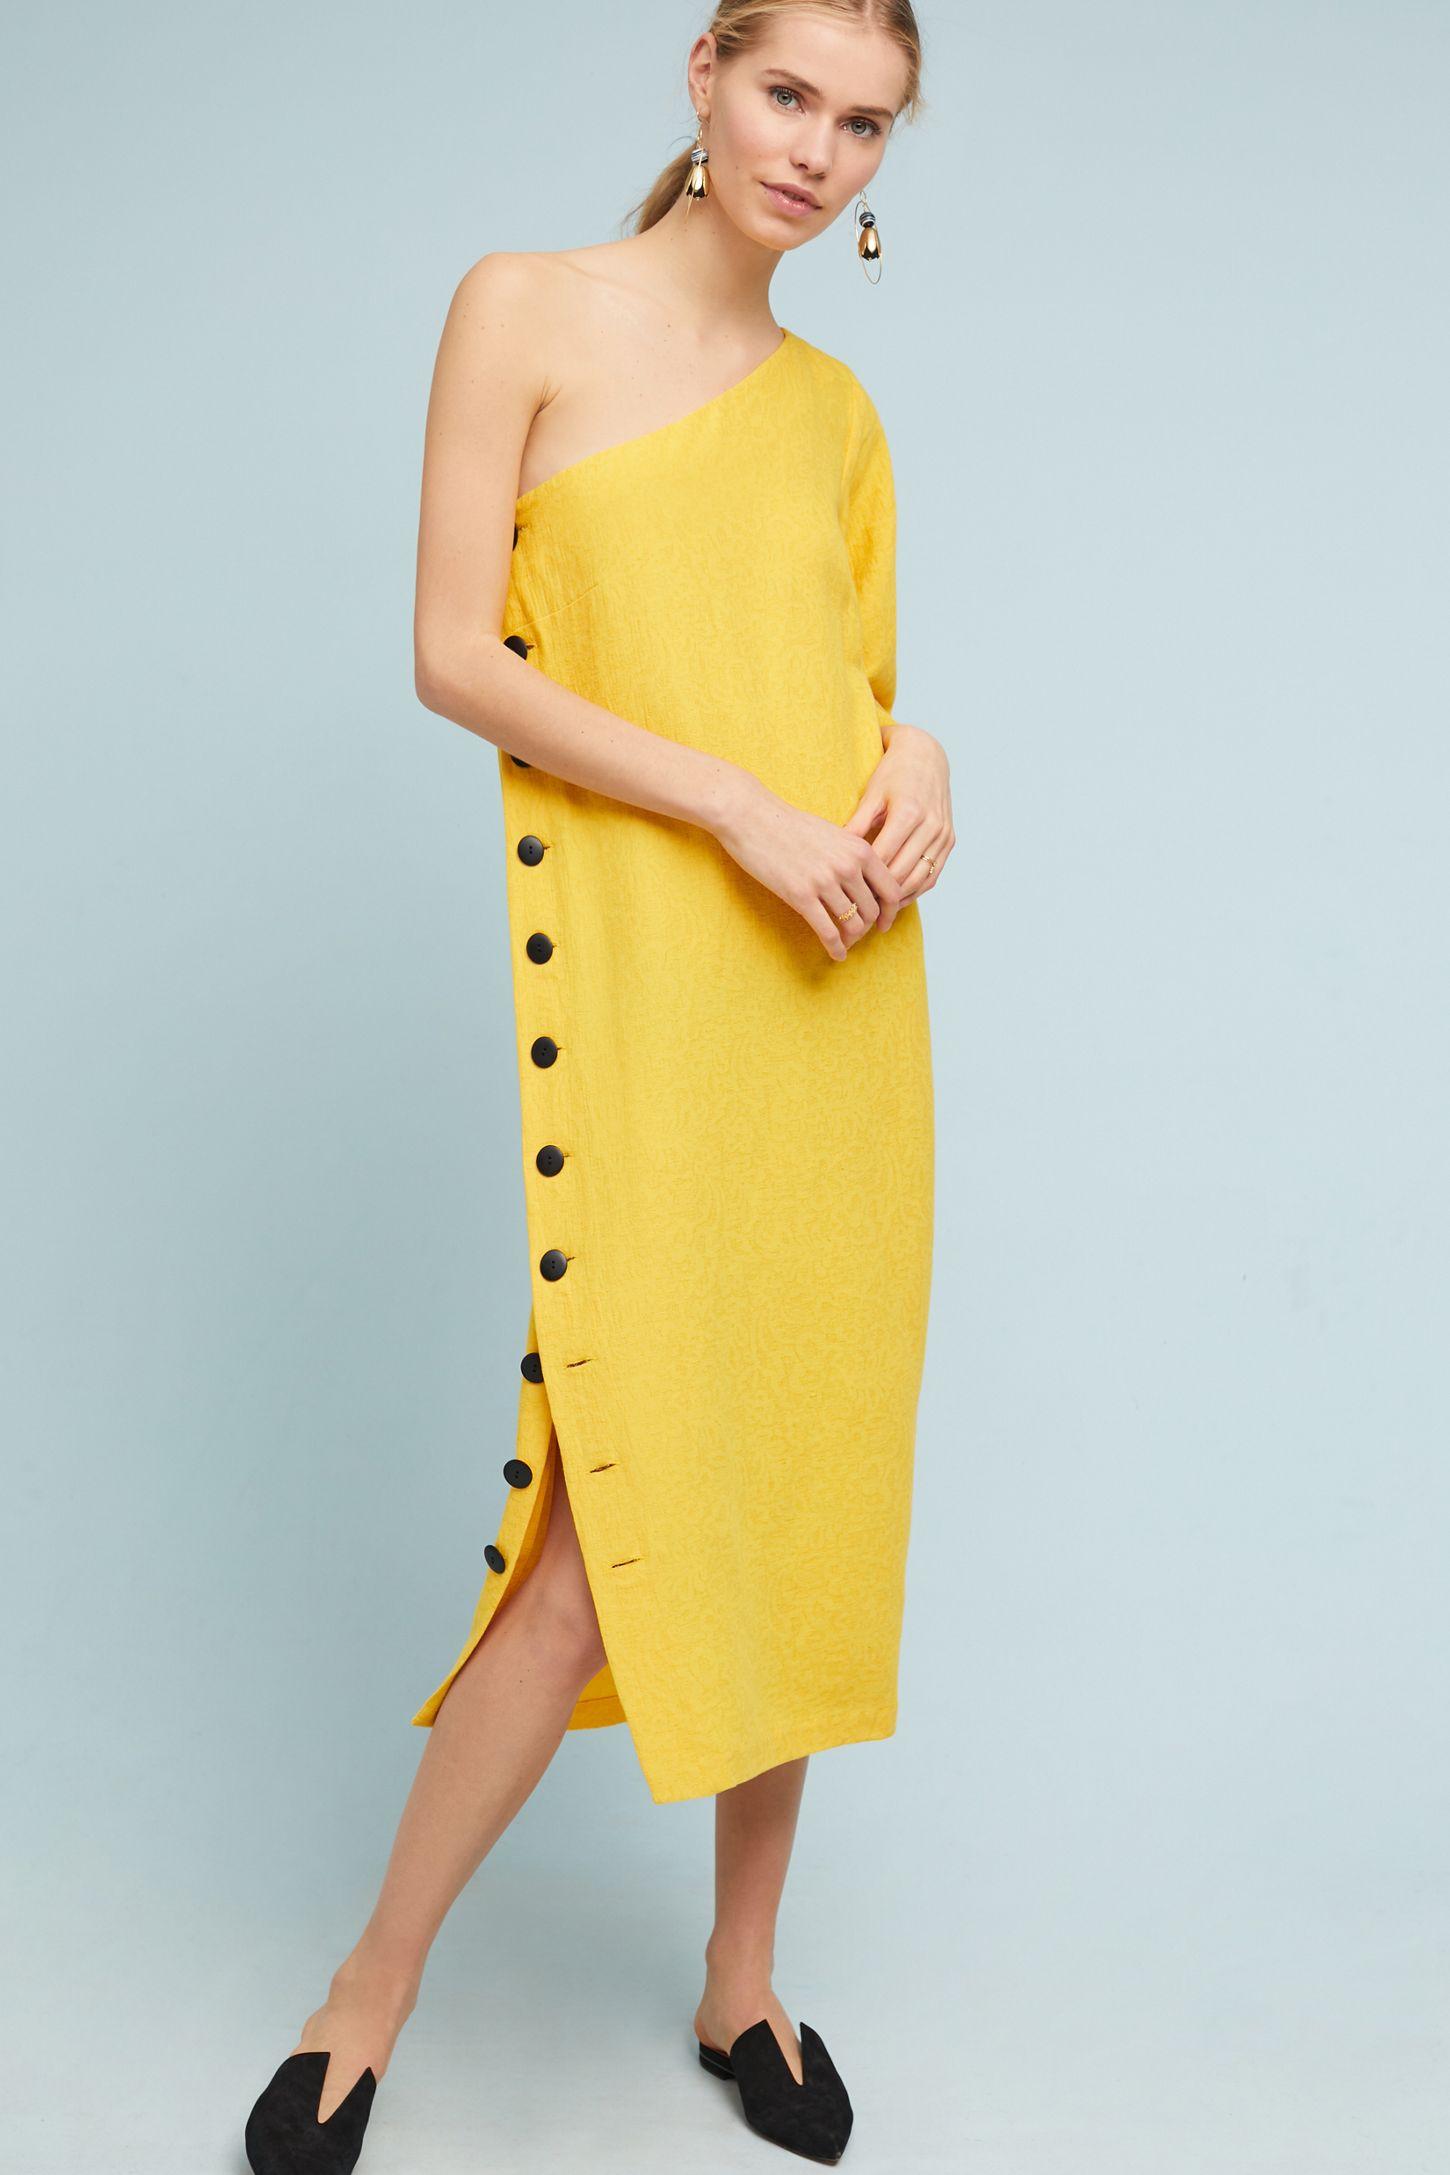 839e814c344 Mara Hoffman Emilie Asymmetrical Dress